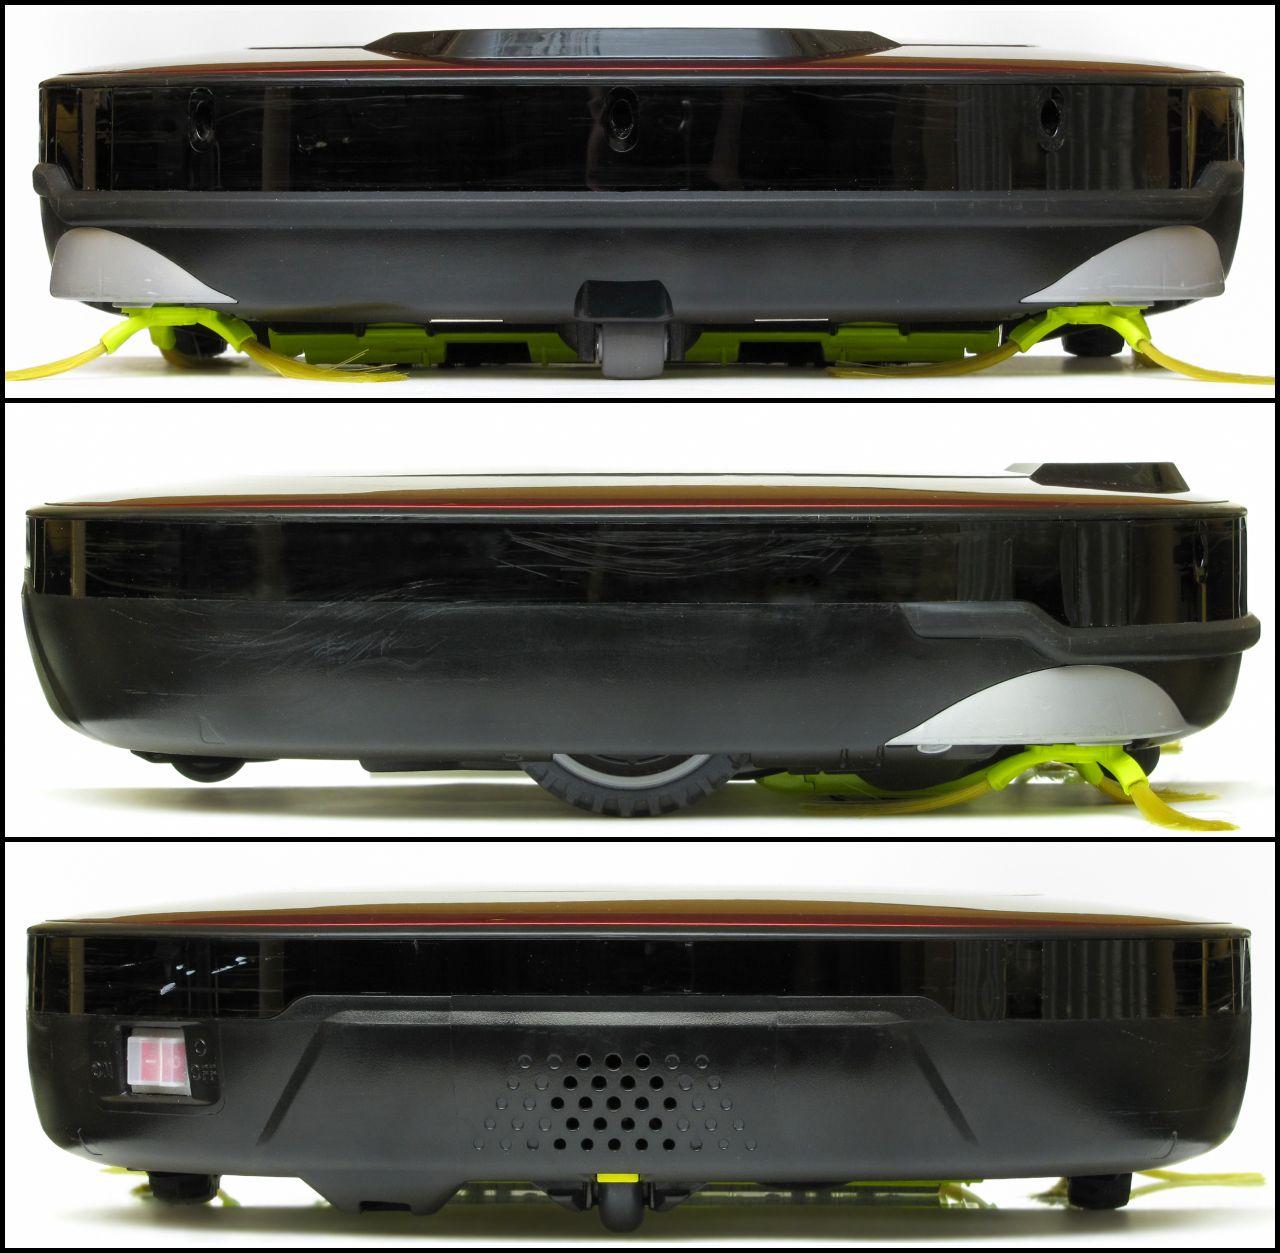 LG Hom-Bot Square 3.0 VR6260LV, vista laterale